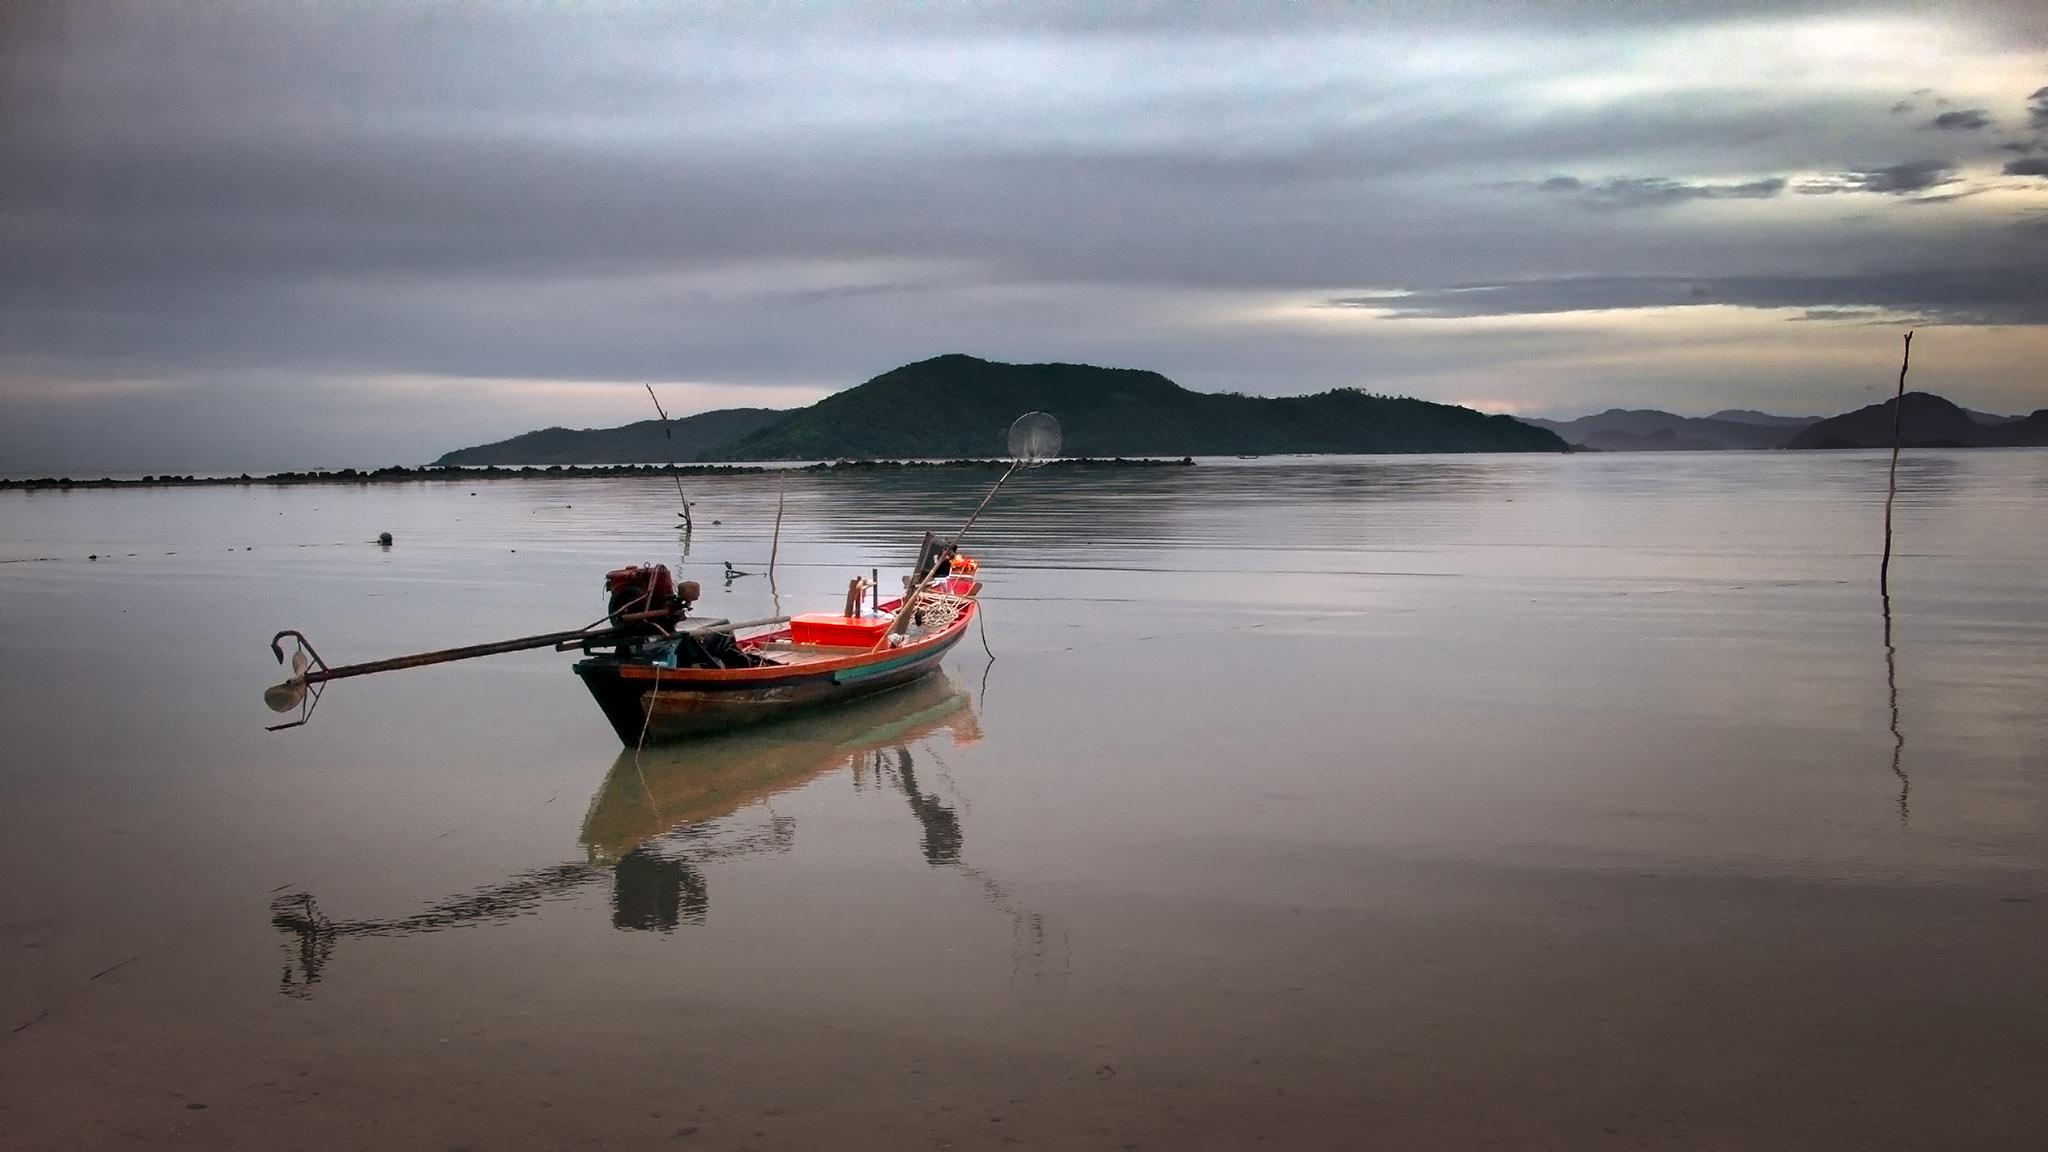 South west coast of Koh Samui, Thailand